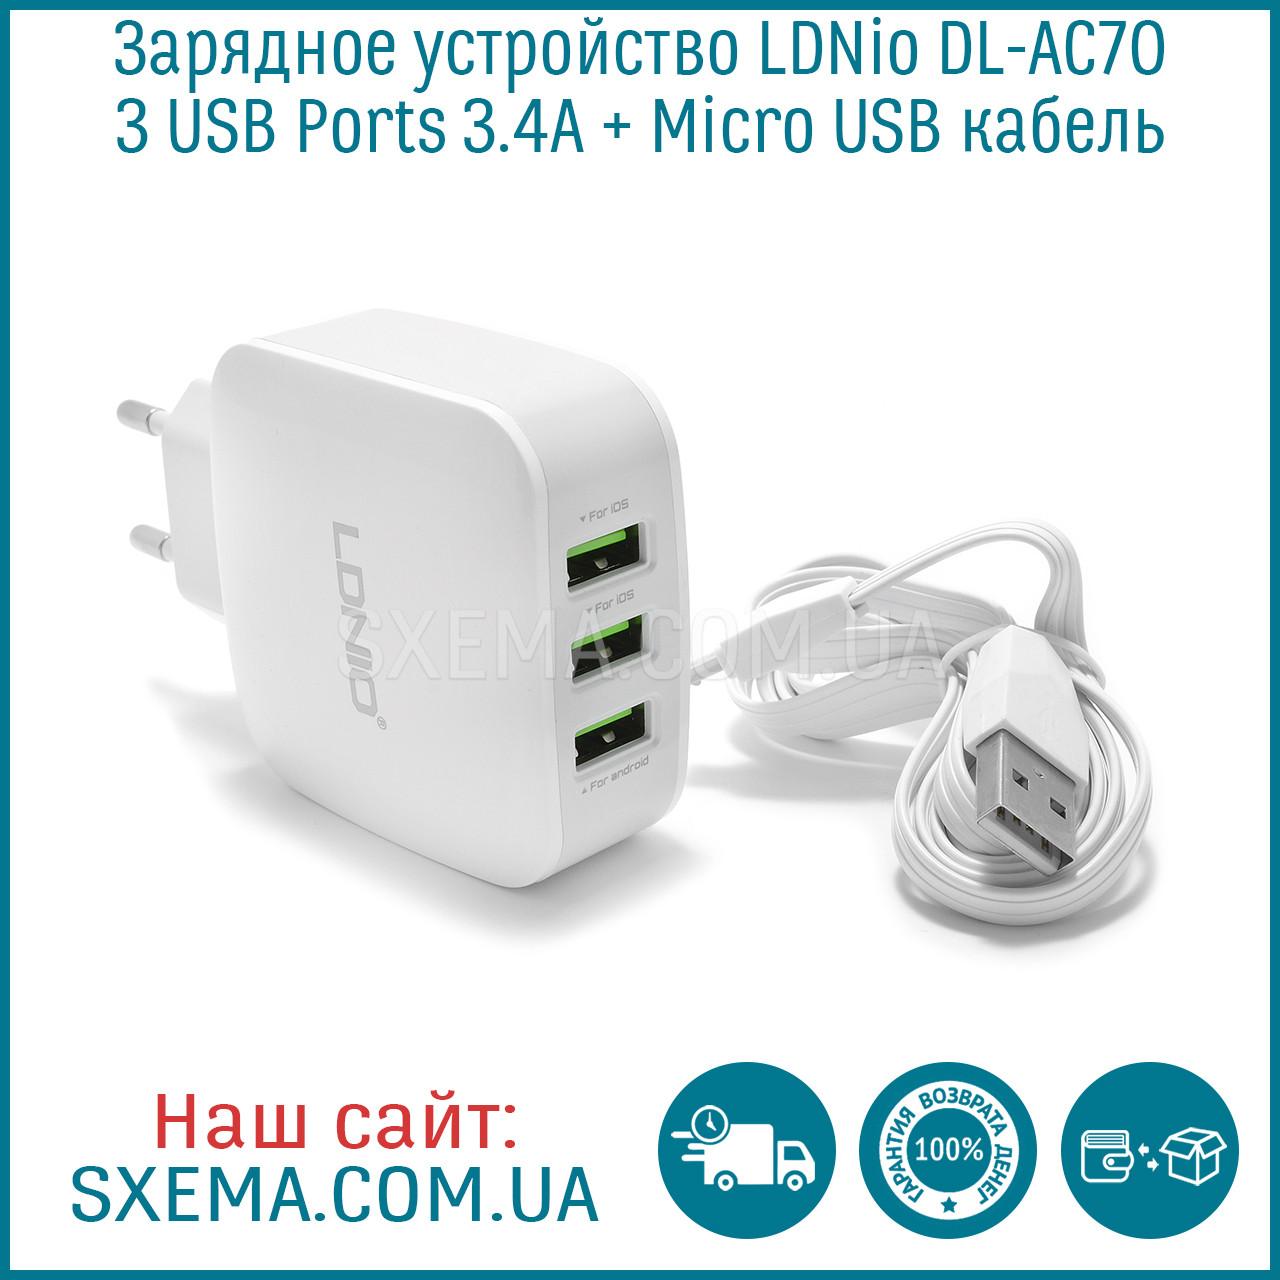 Сетевое зарядное устройство LDNIO DL-AC70 3xUSB 3.4A + кабель micro USB, фото 1